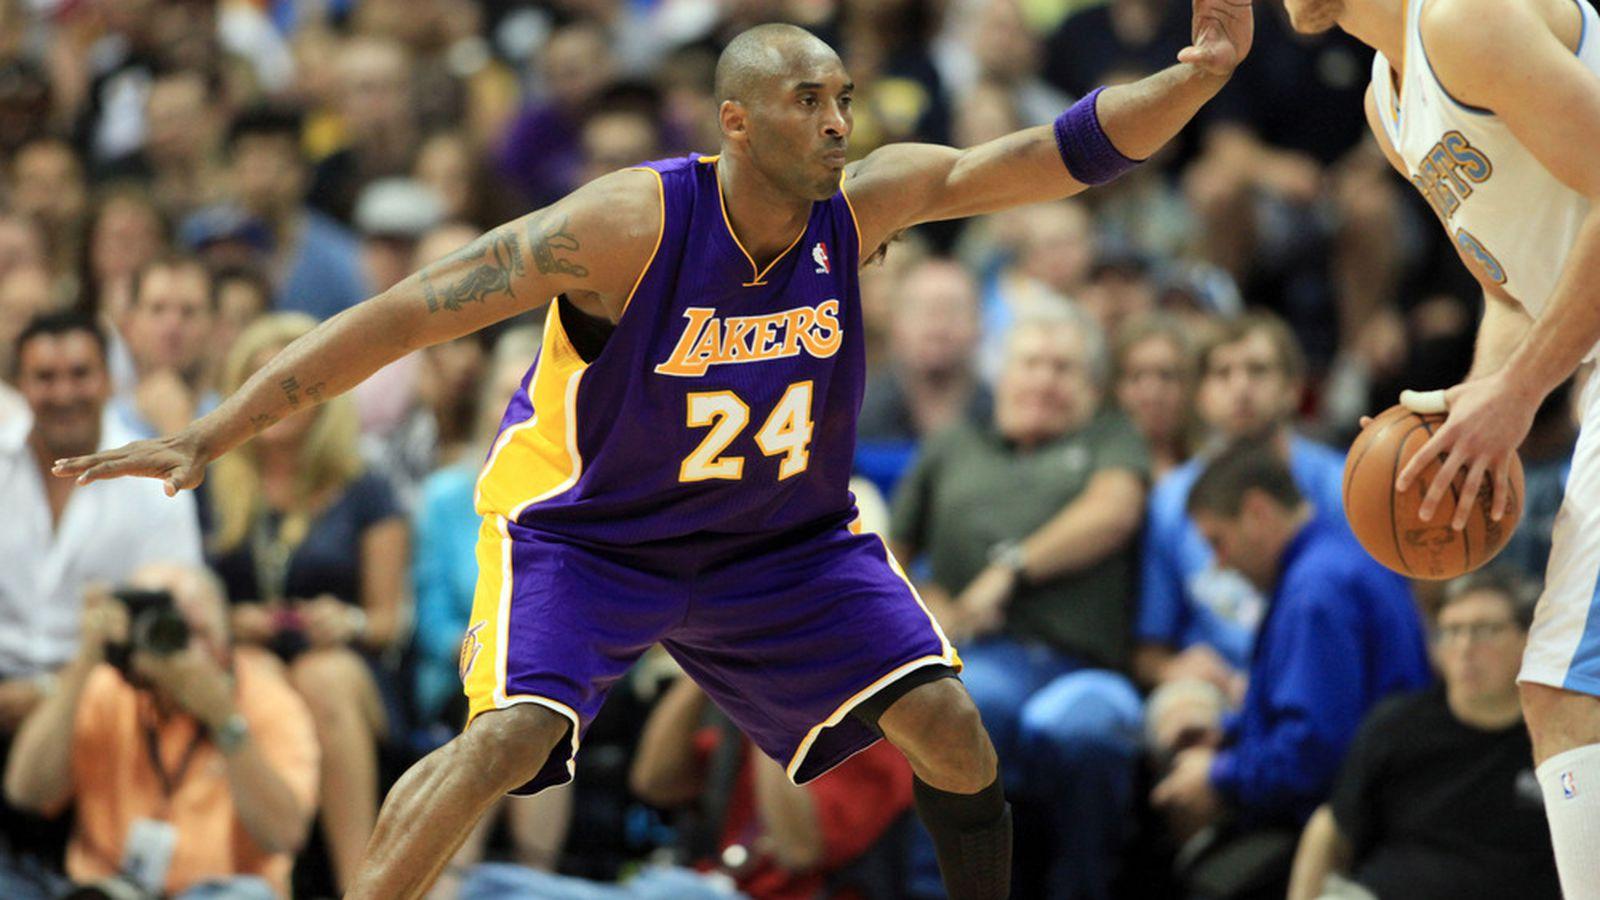 Game 4 Lakers Vs Nuggets First Half Thread ... - Denver Stiffs